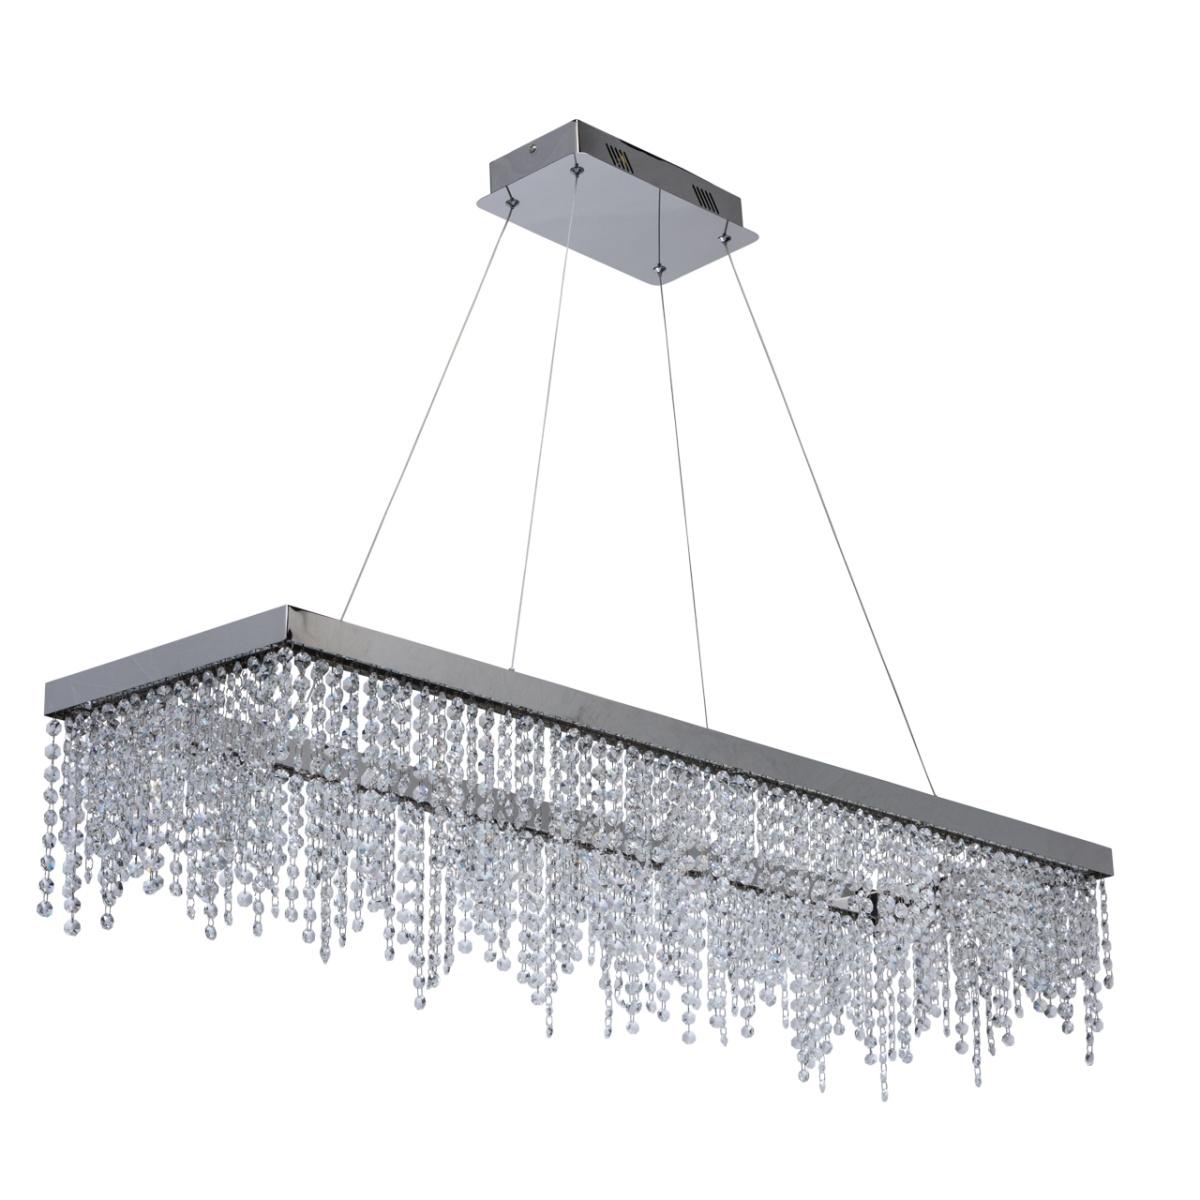 Lustra Chiaro Crystal 642010401